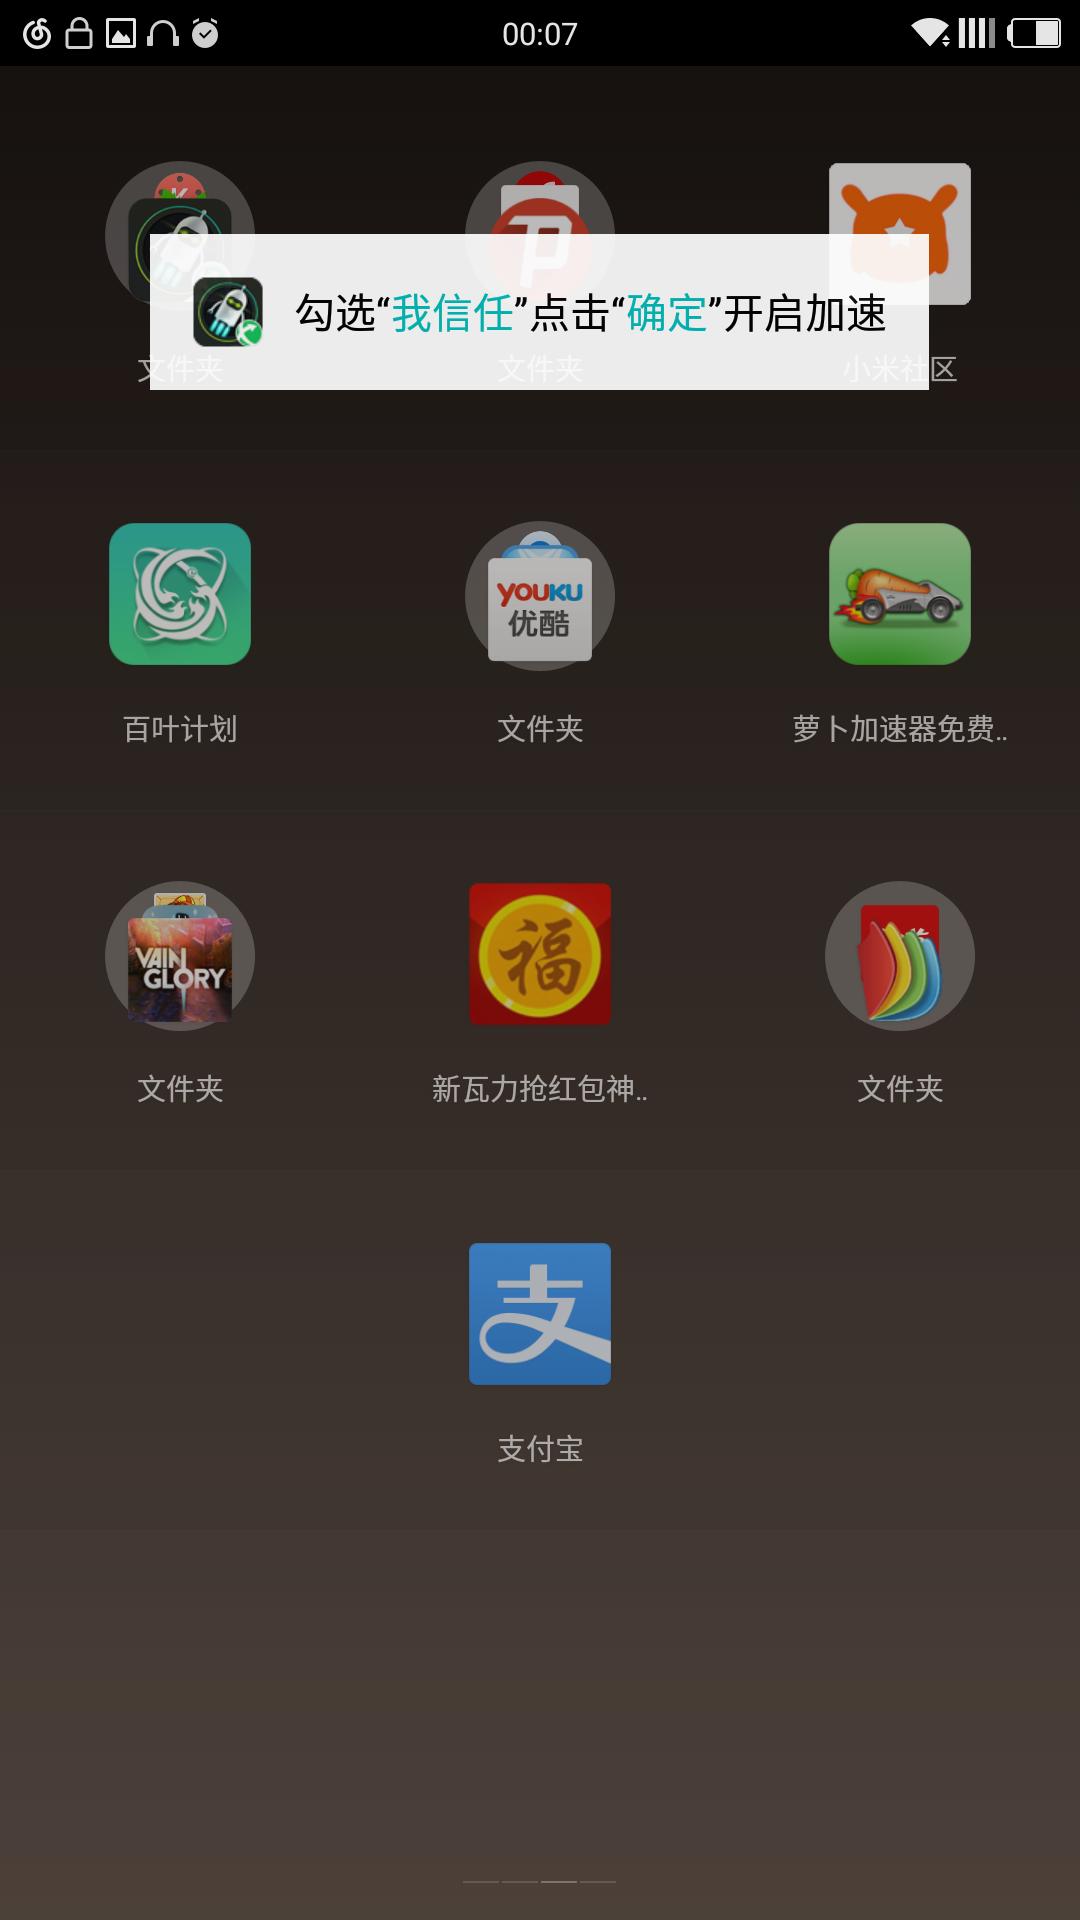 Screenshot_20160409-000718.png